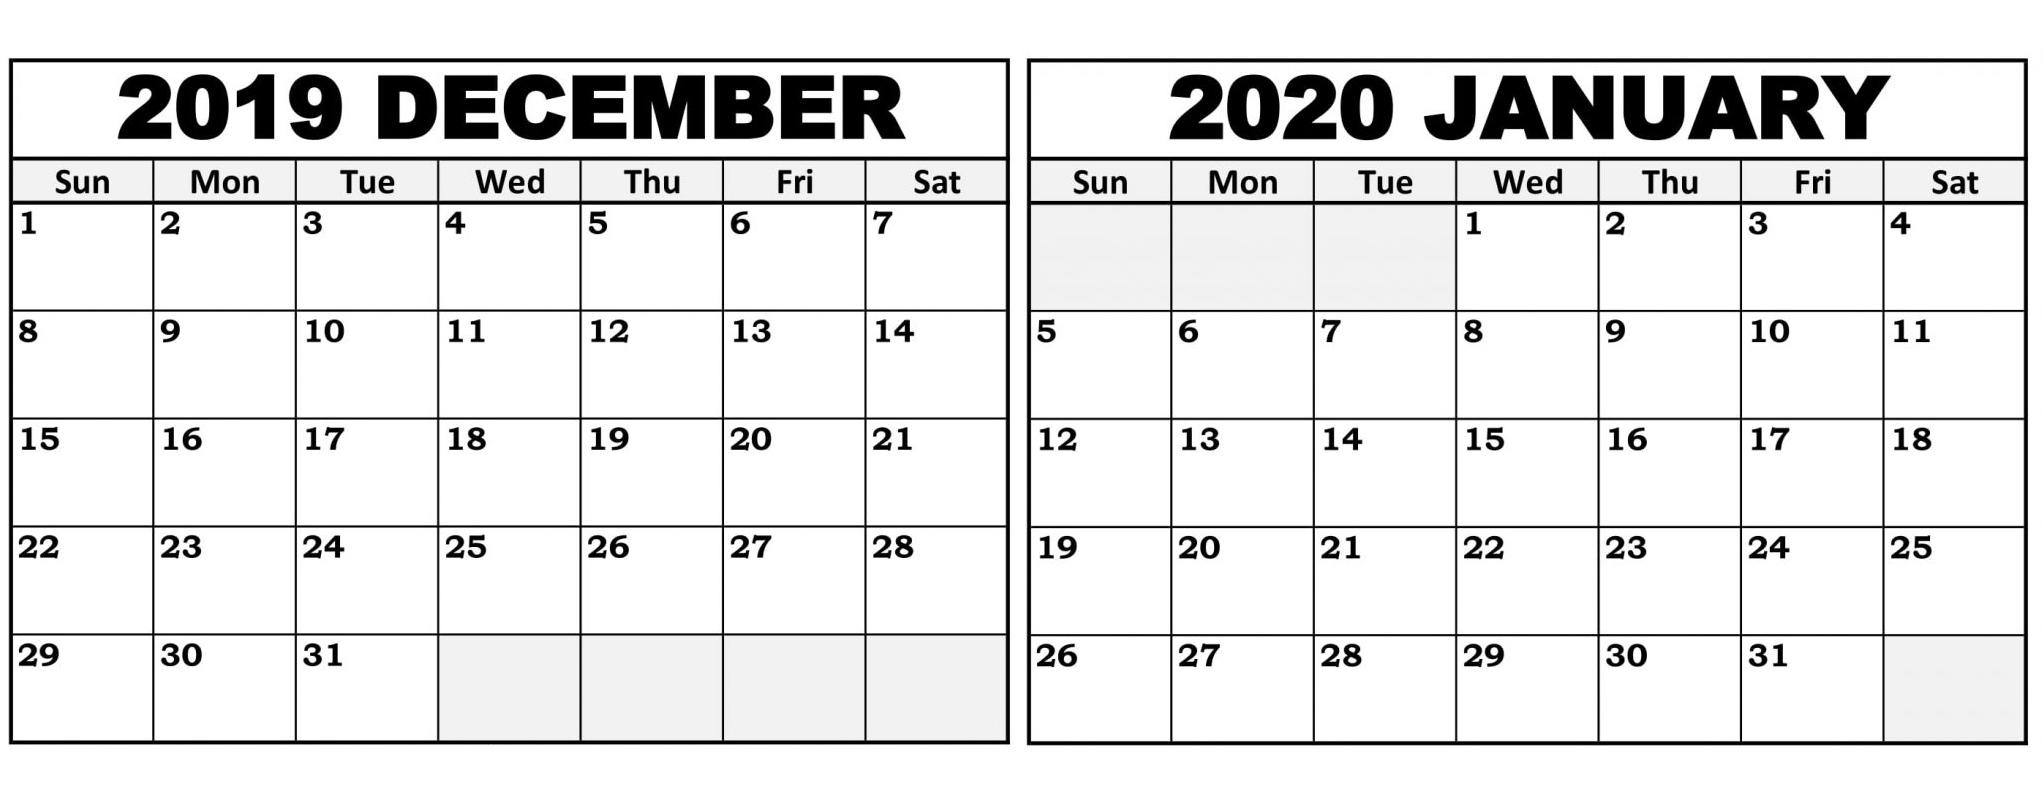 Print Calendar December 2020 And January 2020 | Calendar